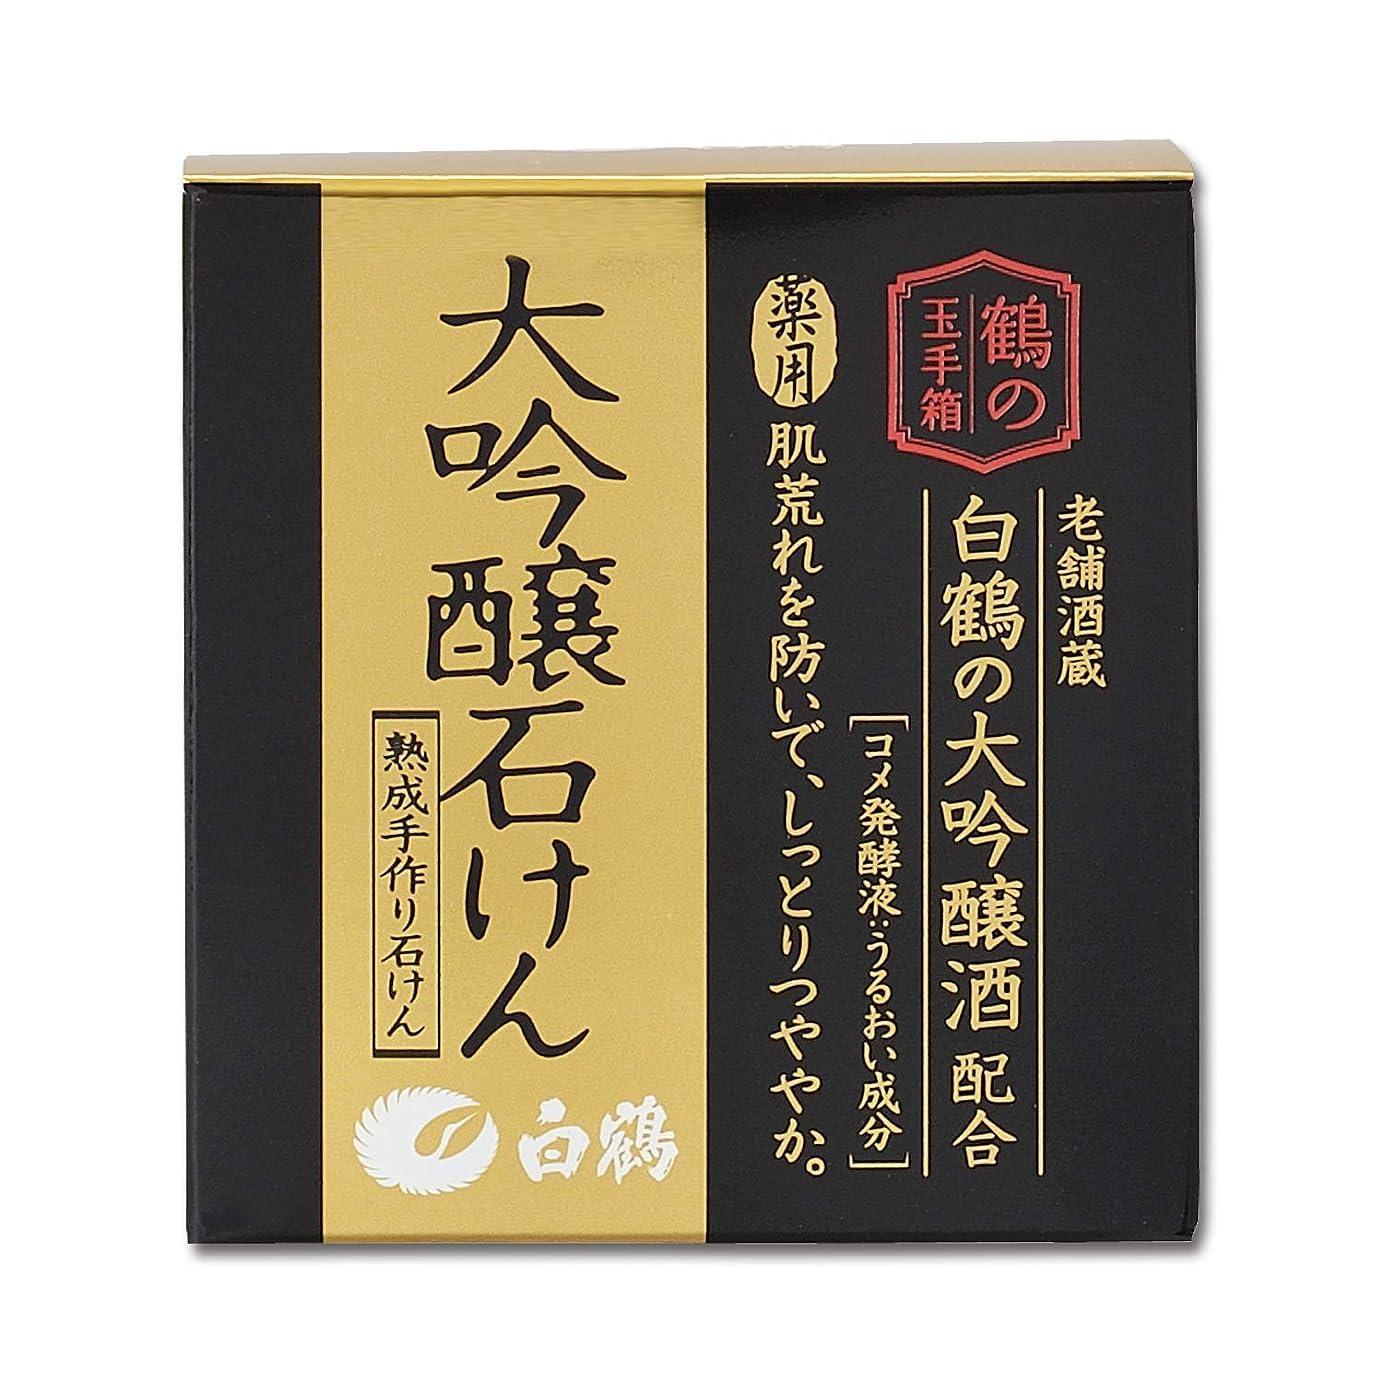 製造業考古学者流行白鶴 鶴の玉手箱 薬用 大吟醸石けん 100g (医薬部外品)